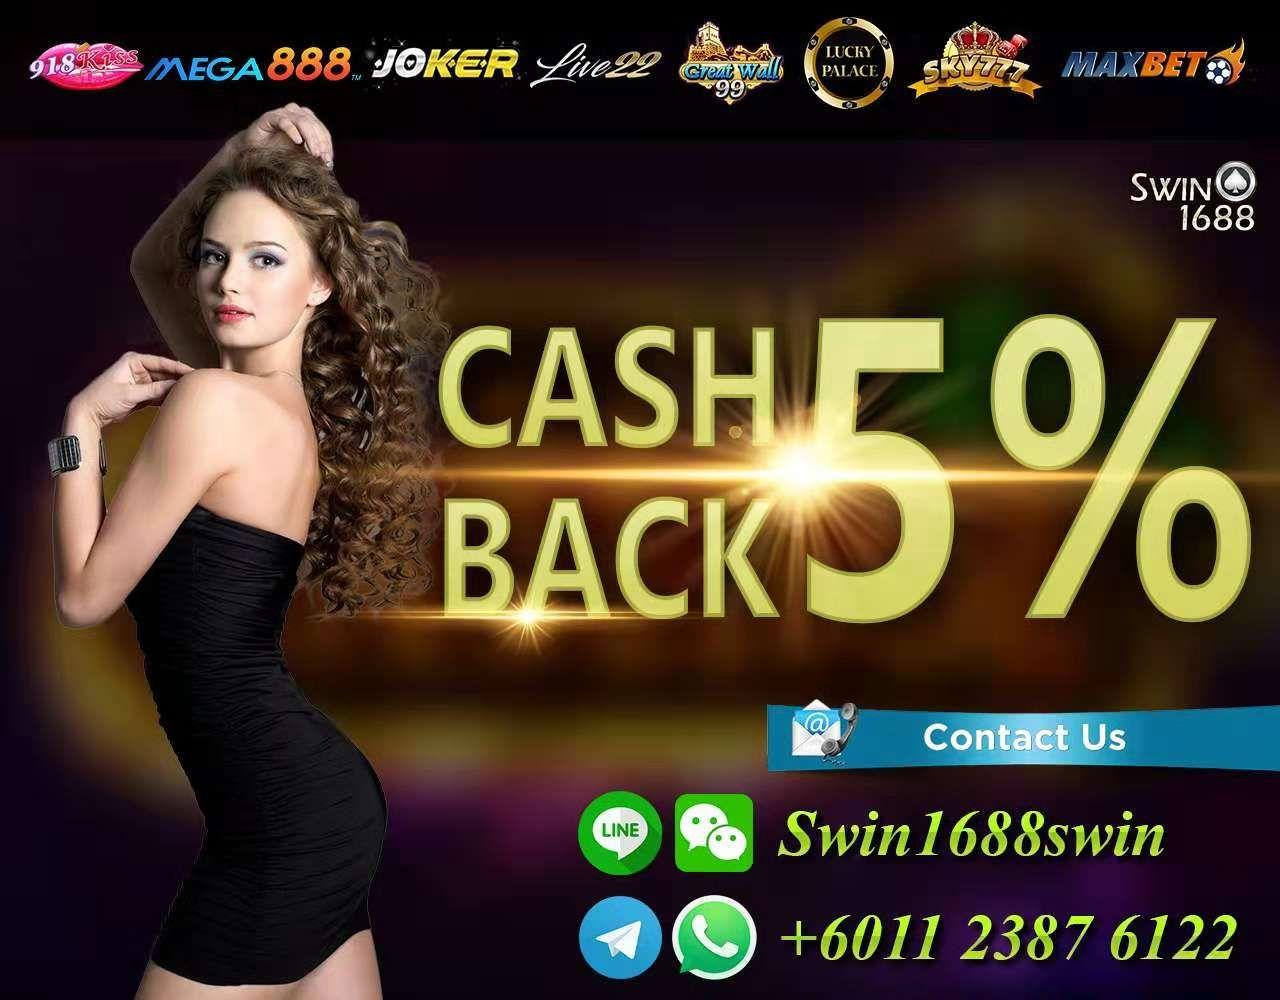 #918kiss #live22 #lpe88 #joker123 #sky777 #maxbet #gw99 #mega888 #casino online #malaysia casino #bigwin #bonus…